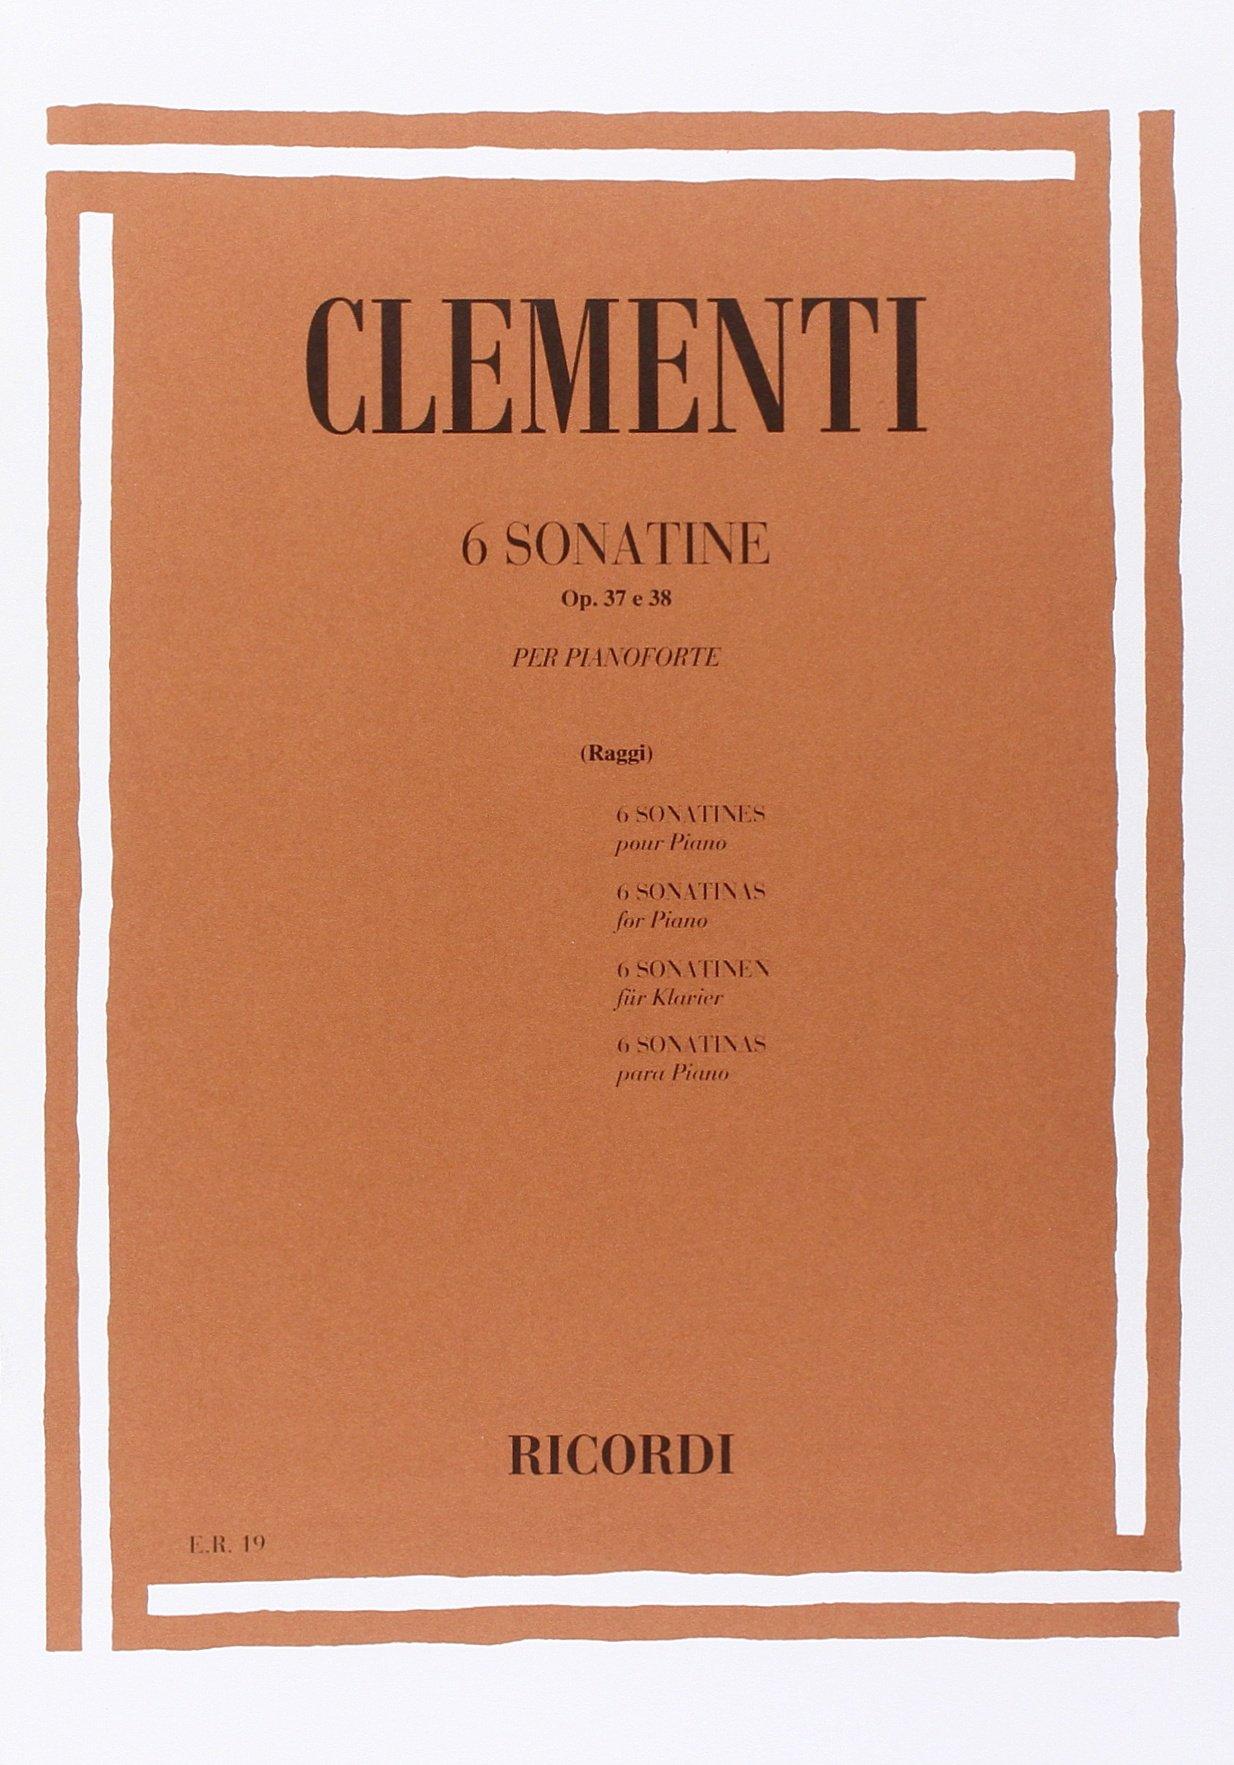 6 SONATINE OP. 37 E 38 (Francese) Copertina flessibile – 1 gen 1984 CLEMENTI M. Ricordi 0041800192 Musique